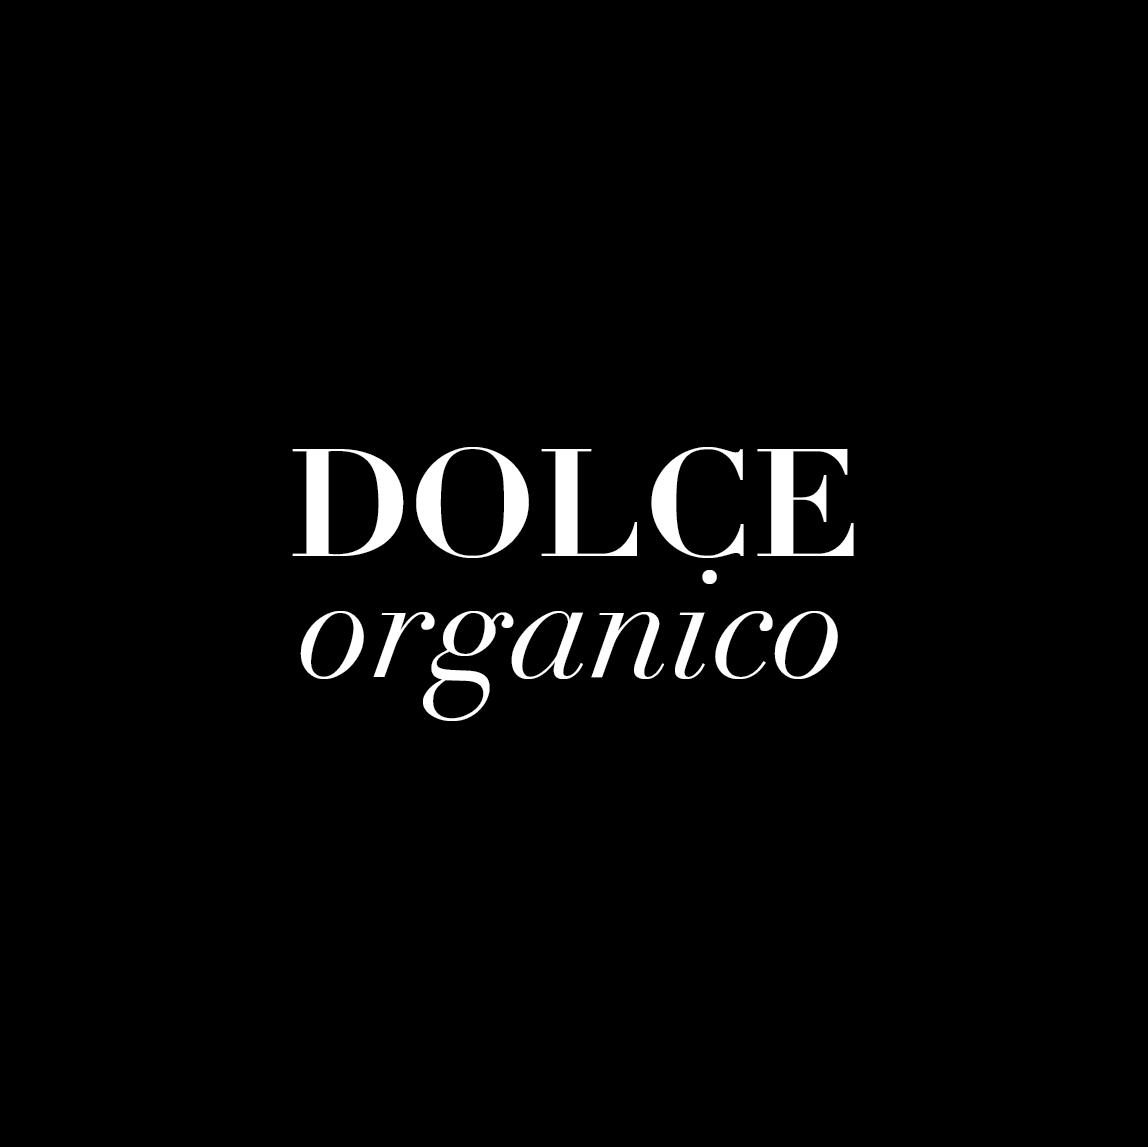 Dolce_Organico_logos-02.png